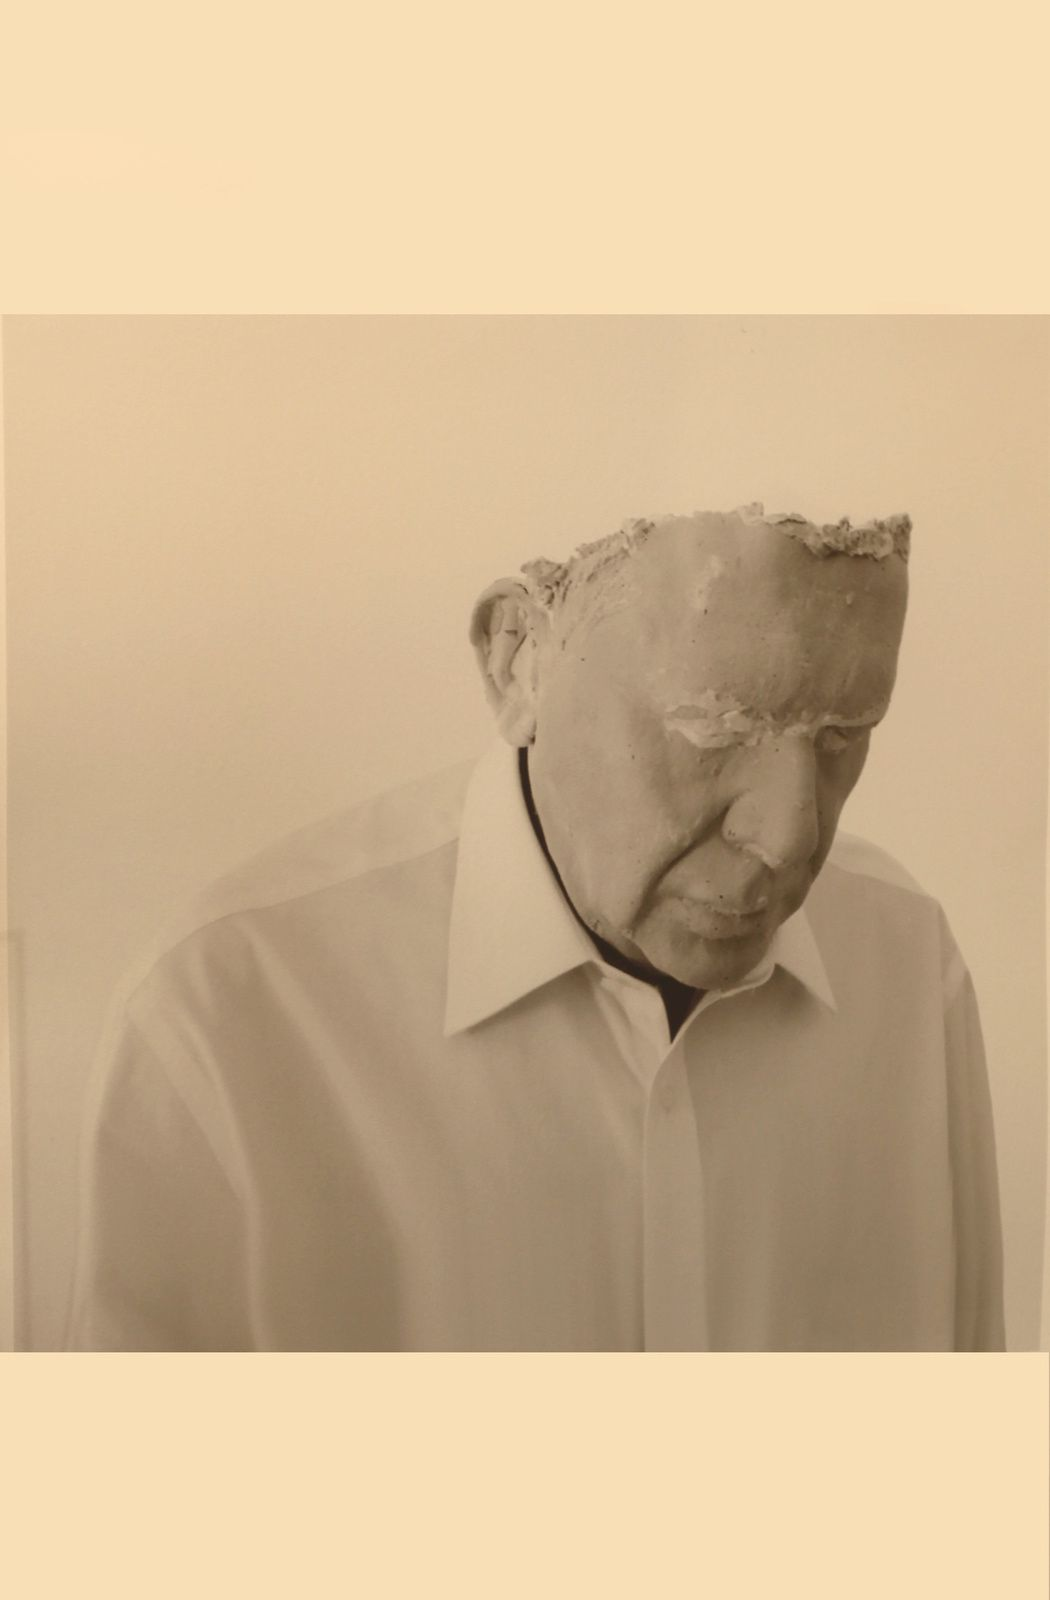 """Pinocchio"", 2006 - 2009 de Jorge MOLDER - Courtesy Galerie Bernard Bouche © Photo Éric Simon"